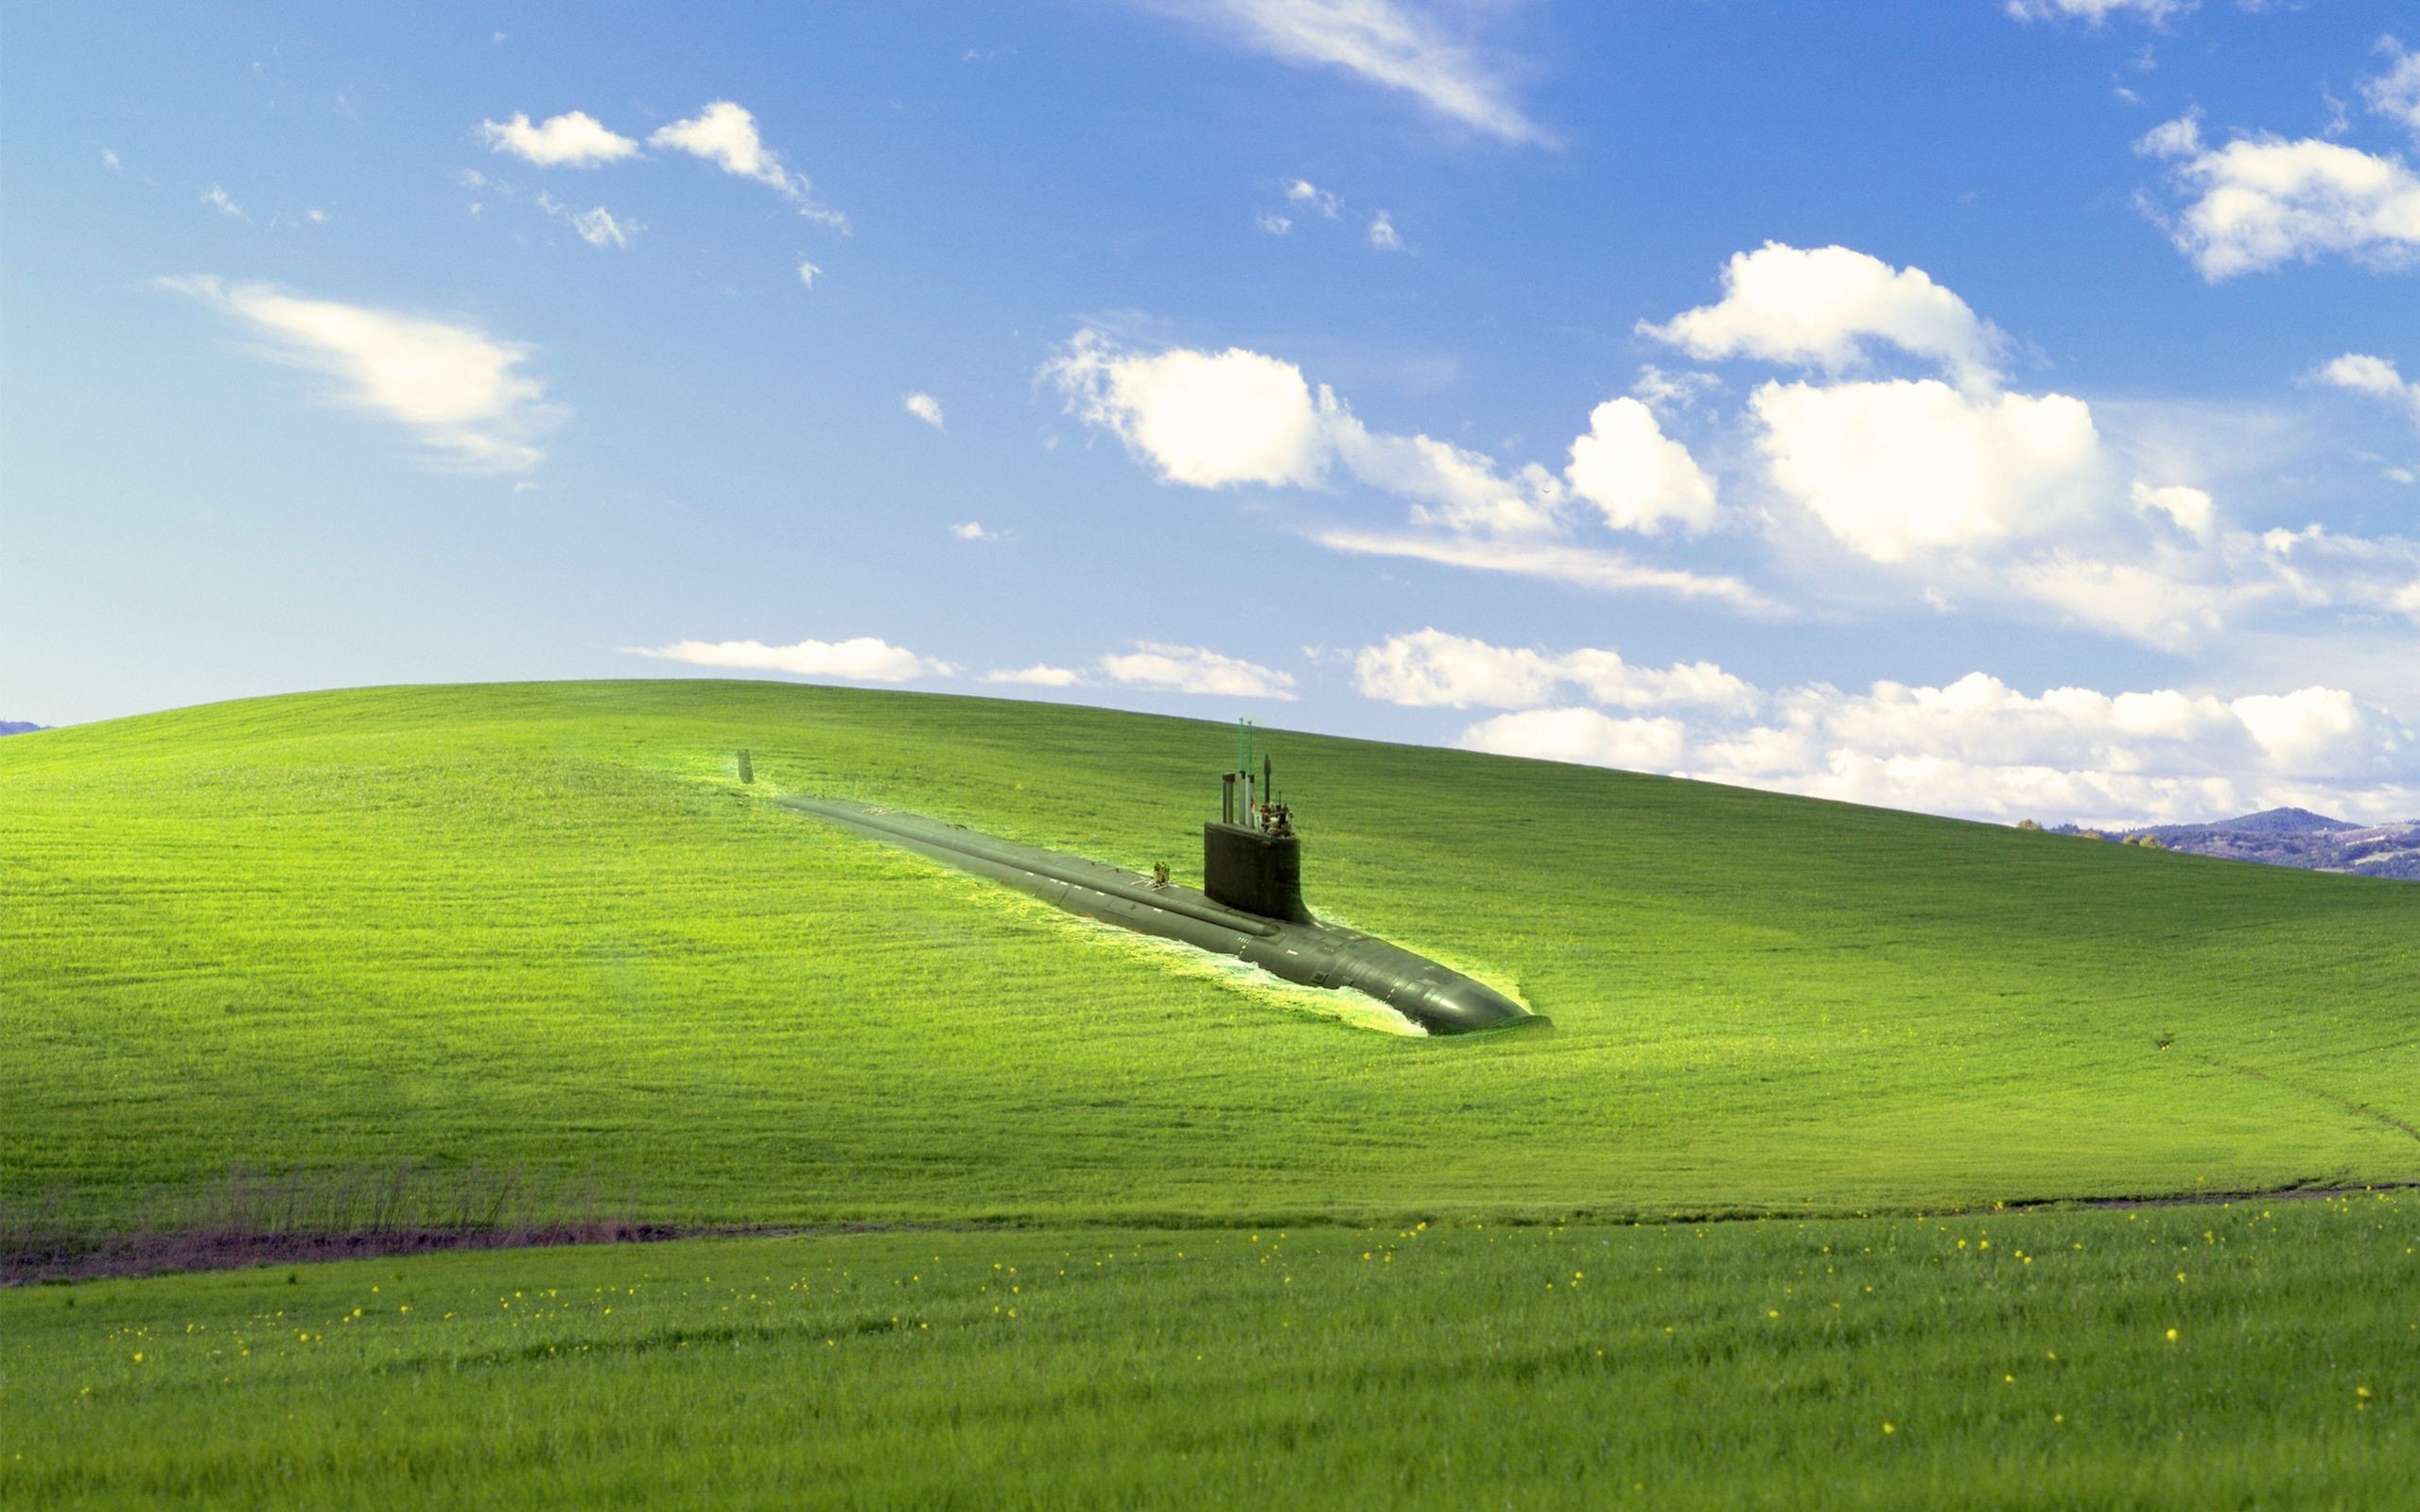 Original Windows 95 Wallpaper 58 Images